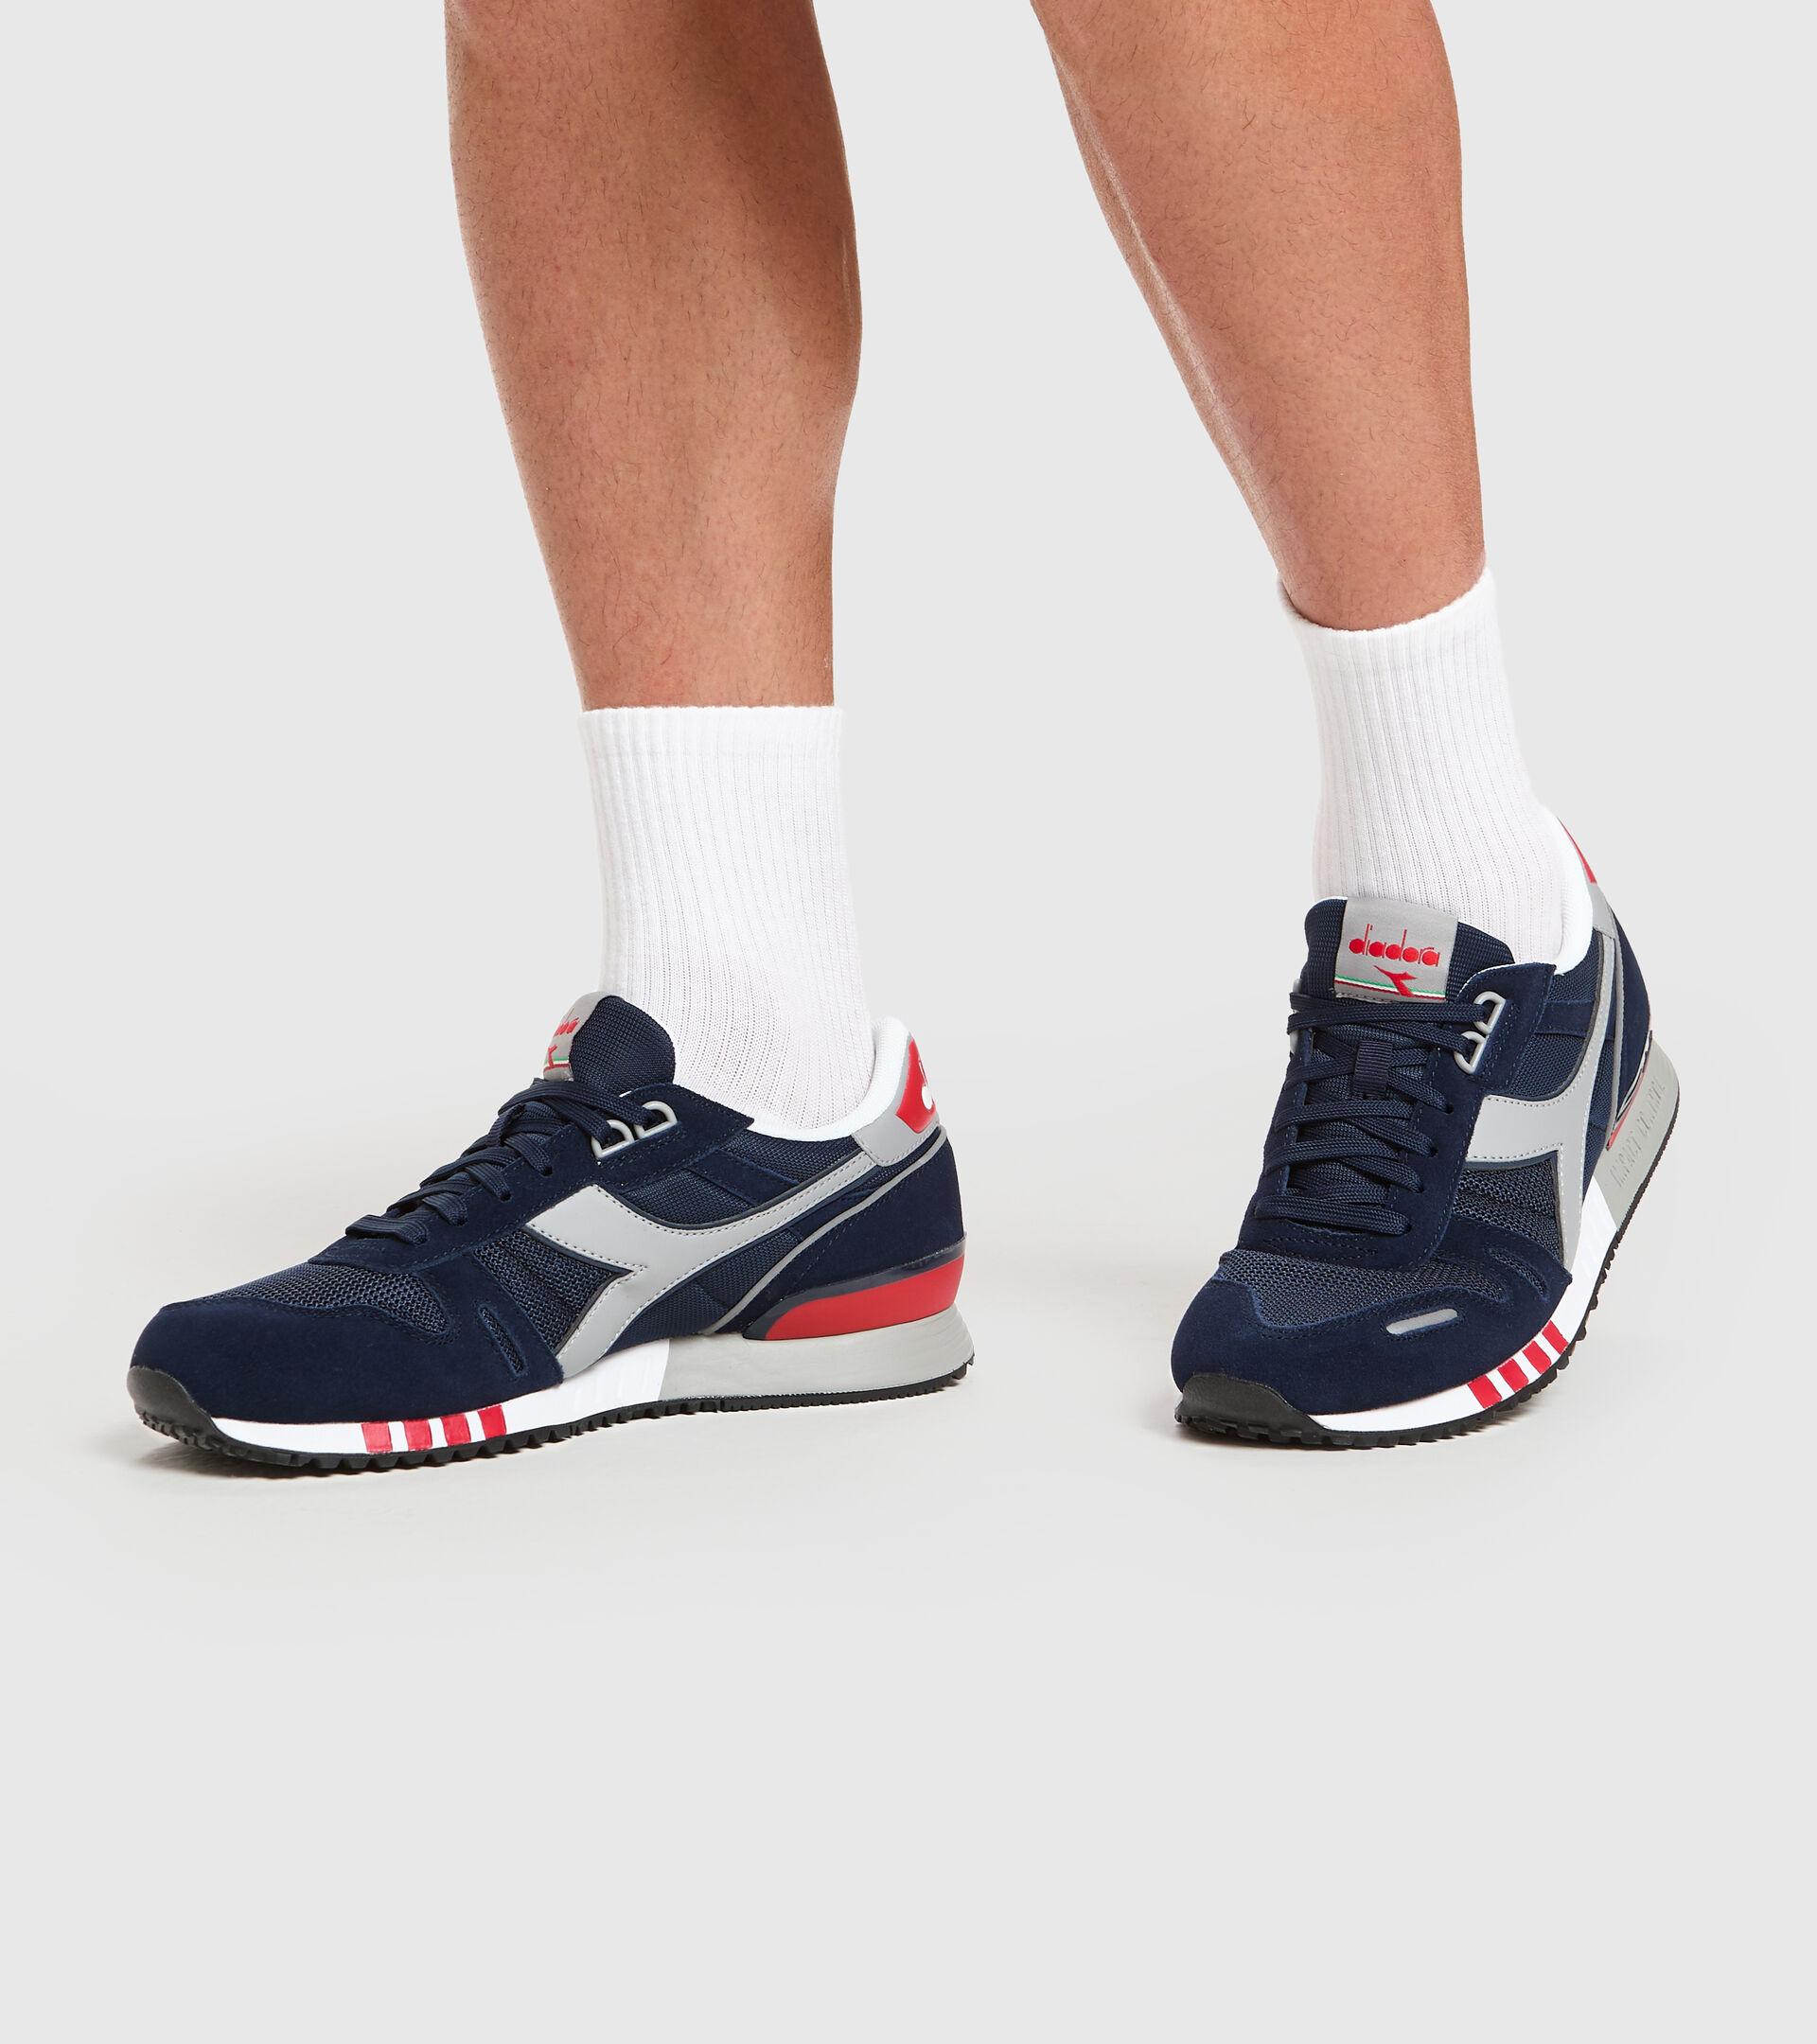 Footwear Sportswear UOMO TITAN CASPIAN SEA/GRIGIO AGATA Diadora